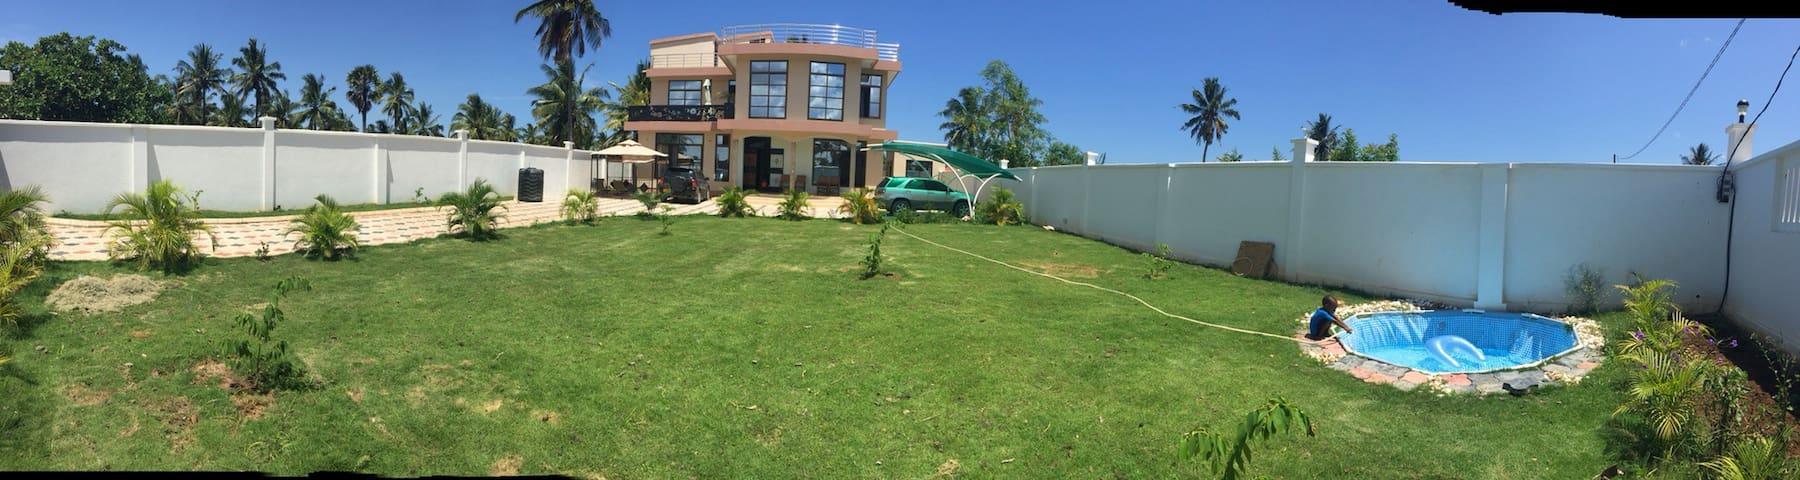 Dar es salaam Single family home